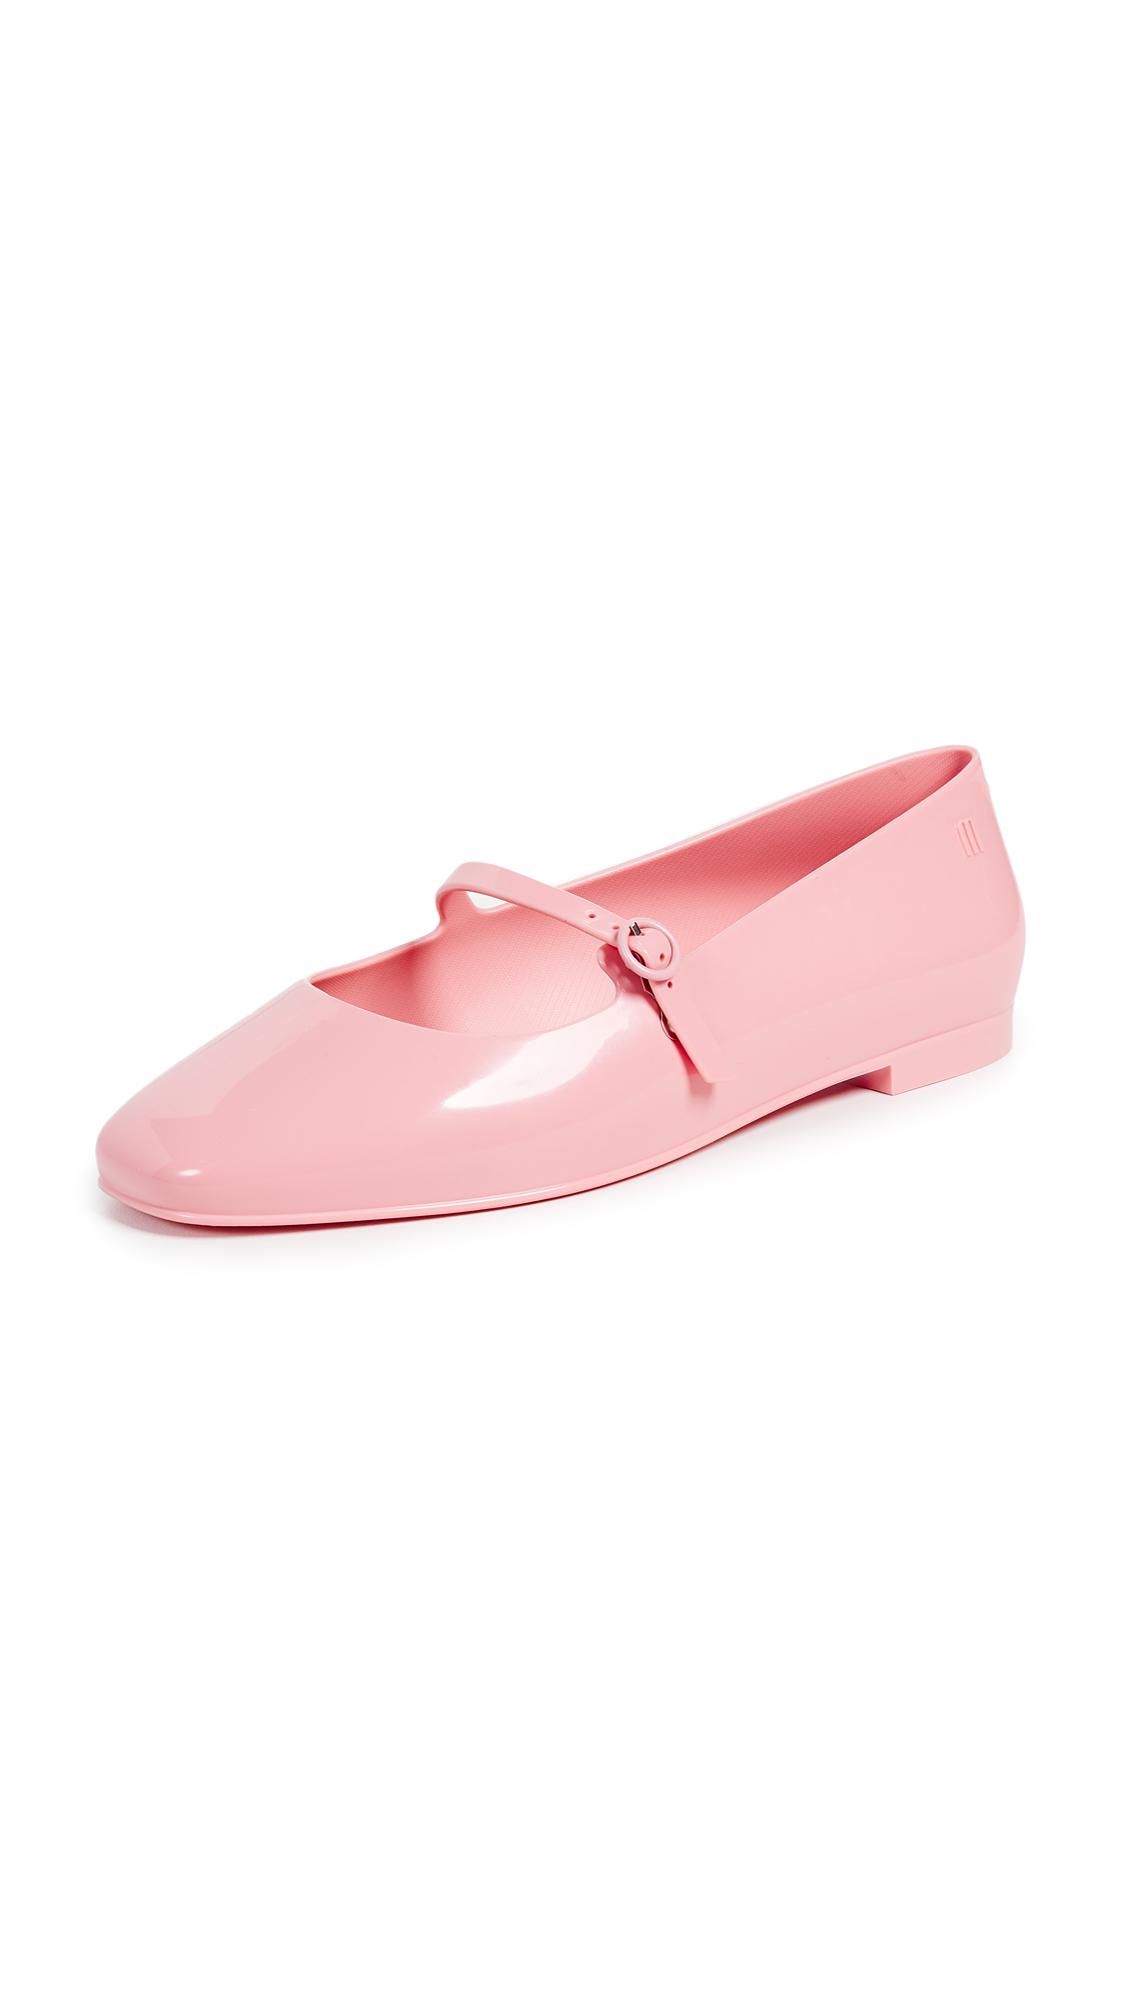 Melissa Believe Mary Jane Flats - Pink Beige